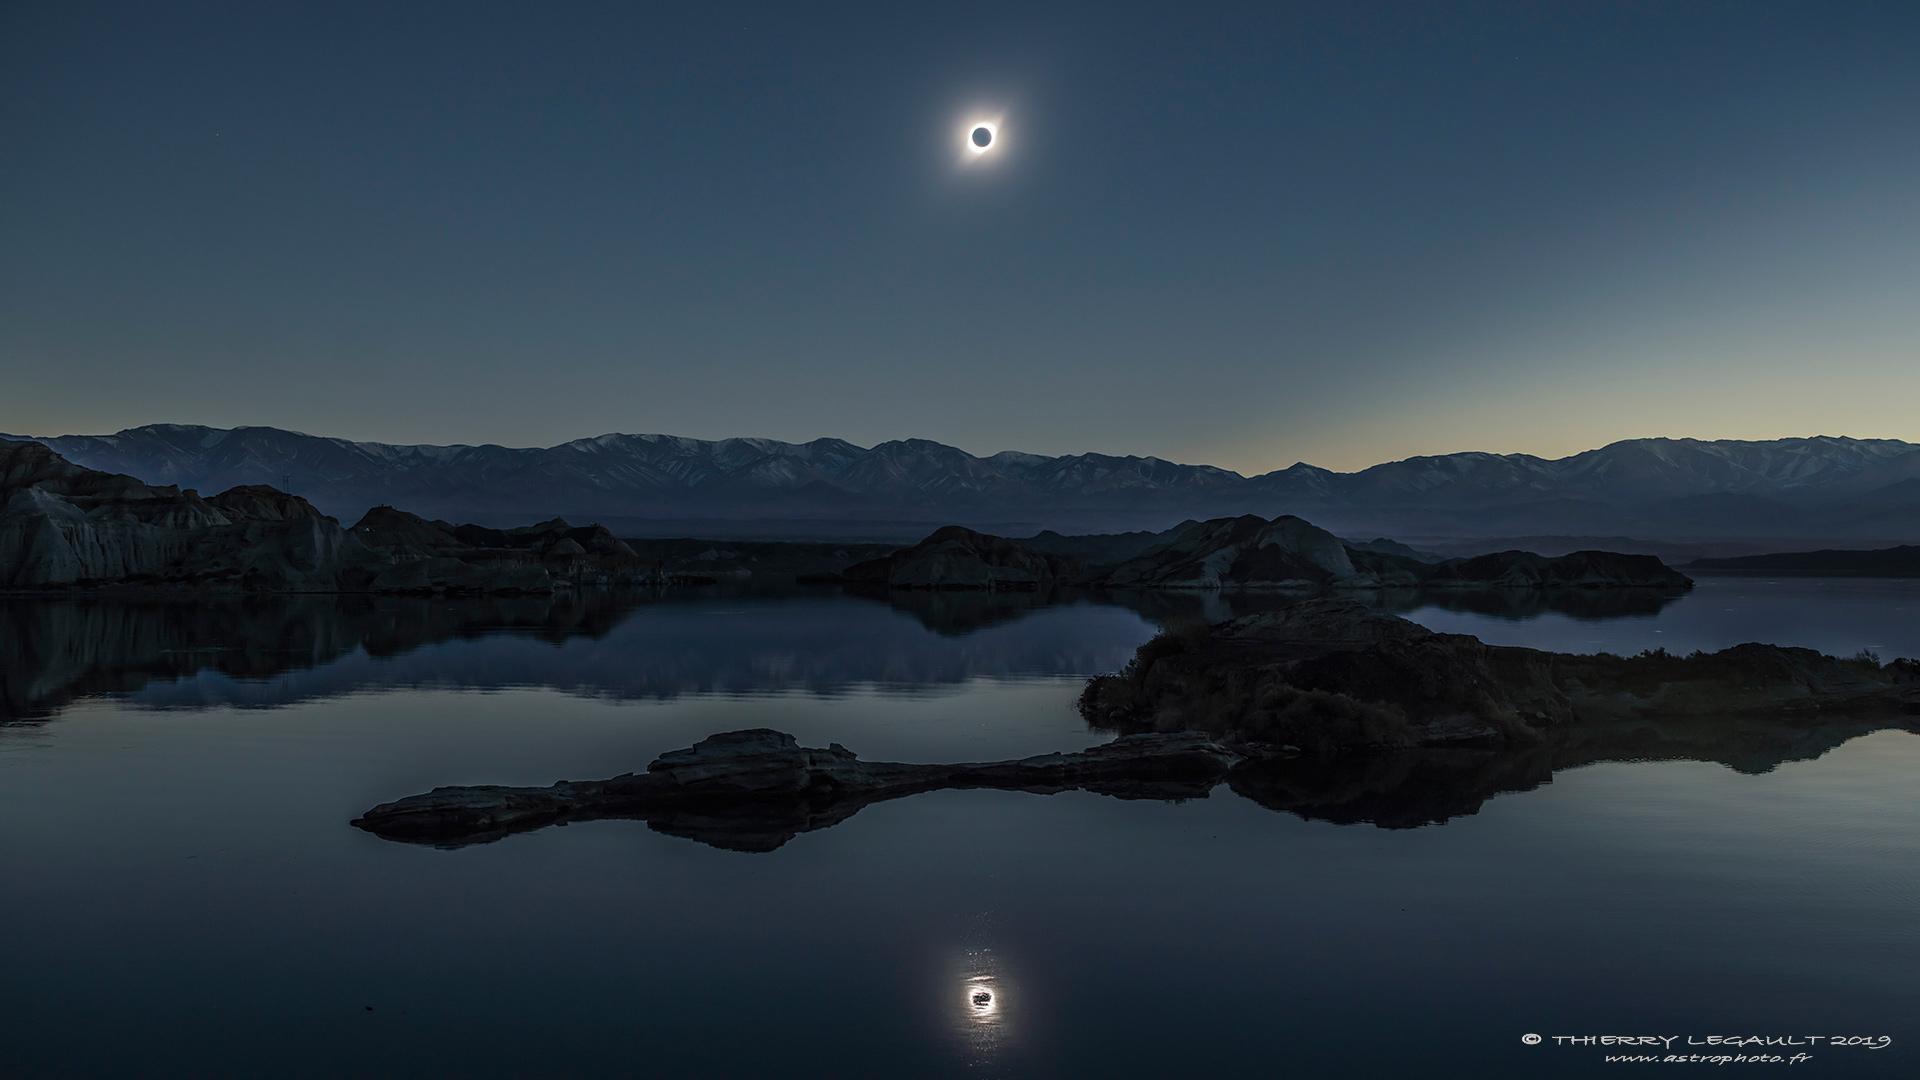 DoubleEclipse_Legault_1920.jpg